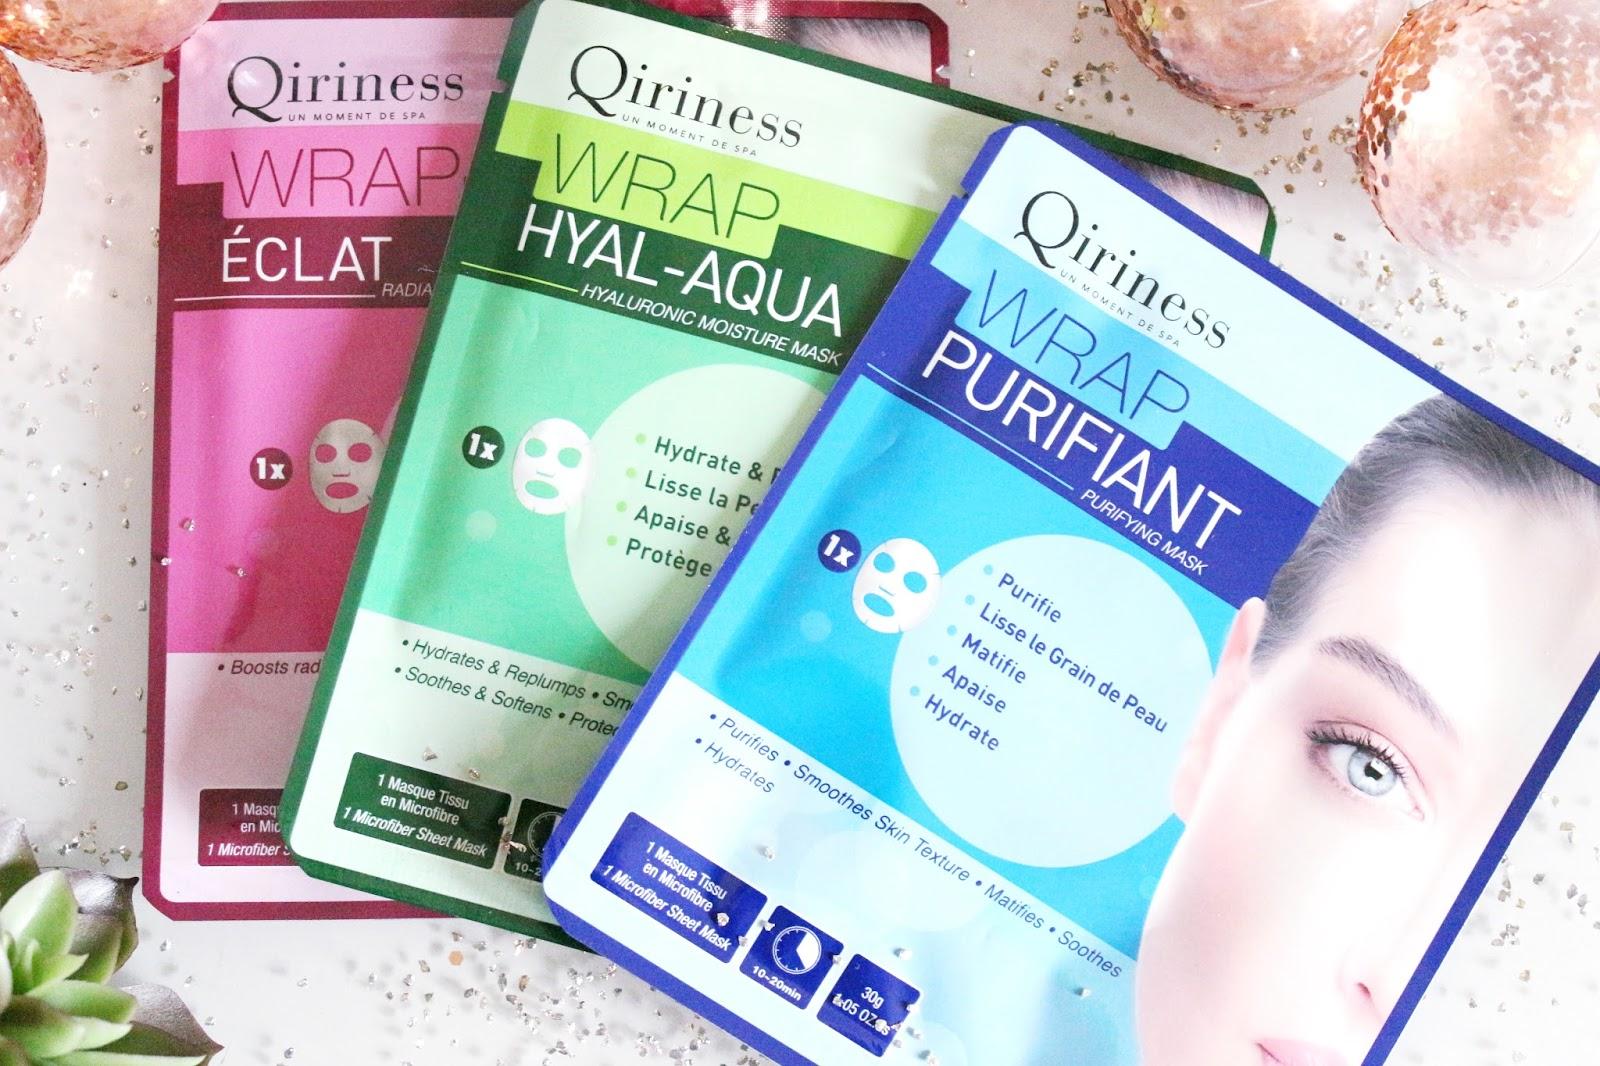 Wrap Quiriness